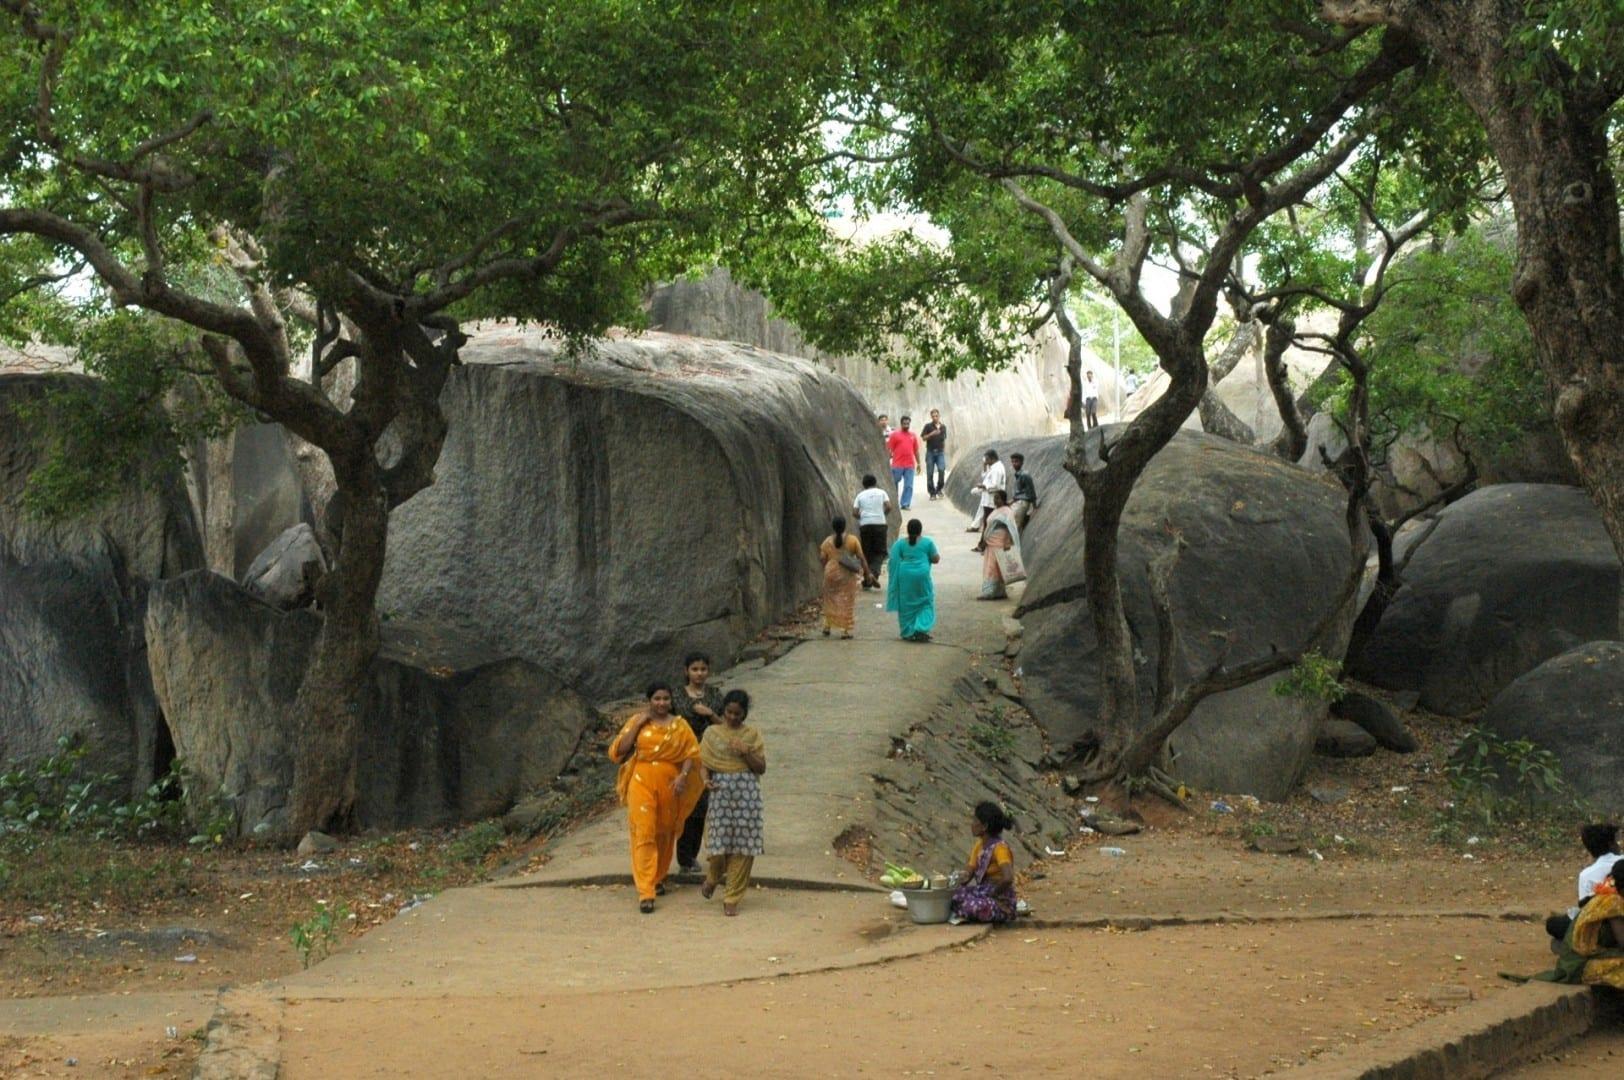 Caminando por el bosque Mamallapuram-Mahabalipuram India